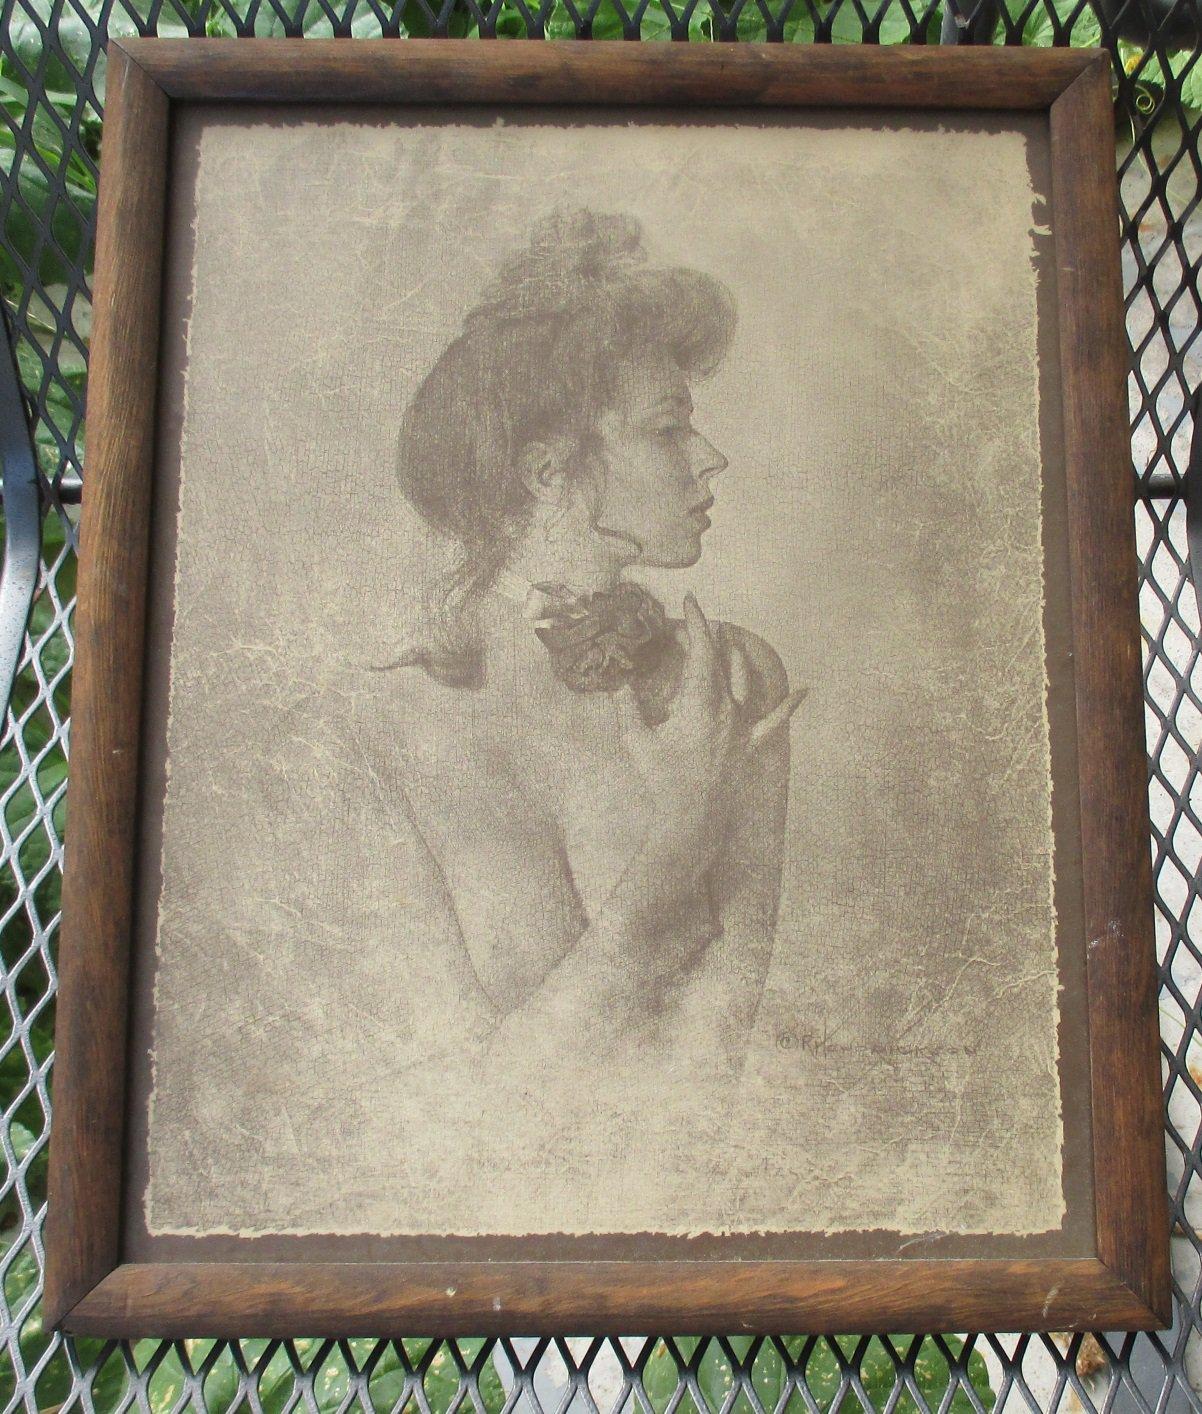 R. Hendrickson Art Print Sepia Wooden Framed, Topless Lady wearing collar